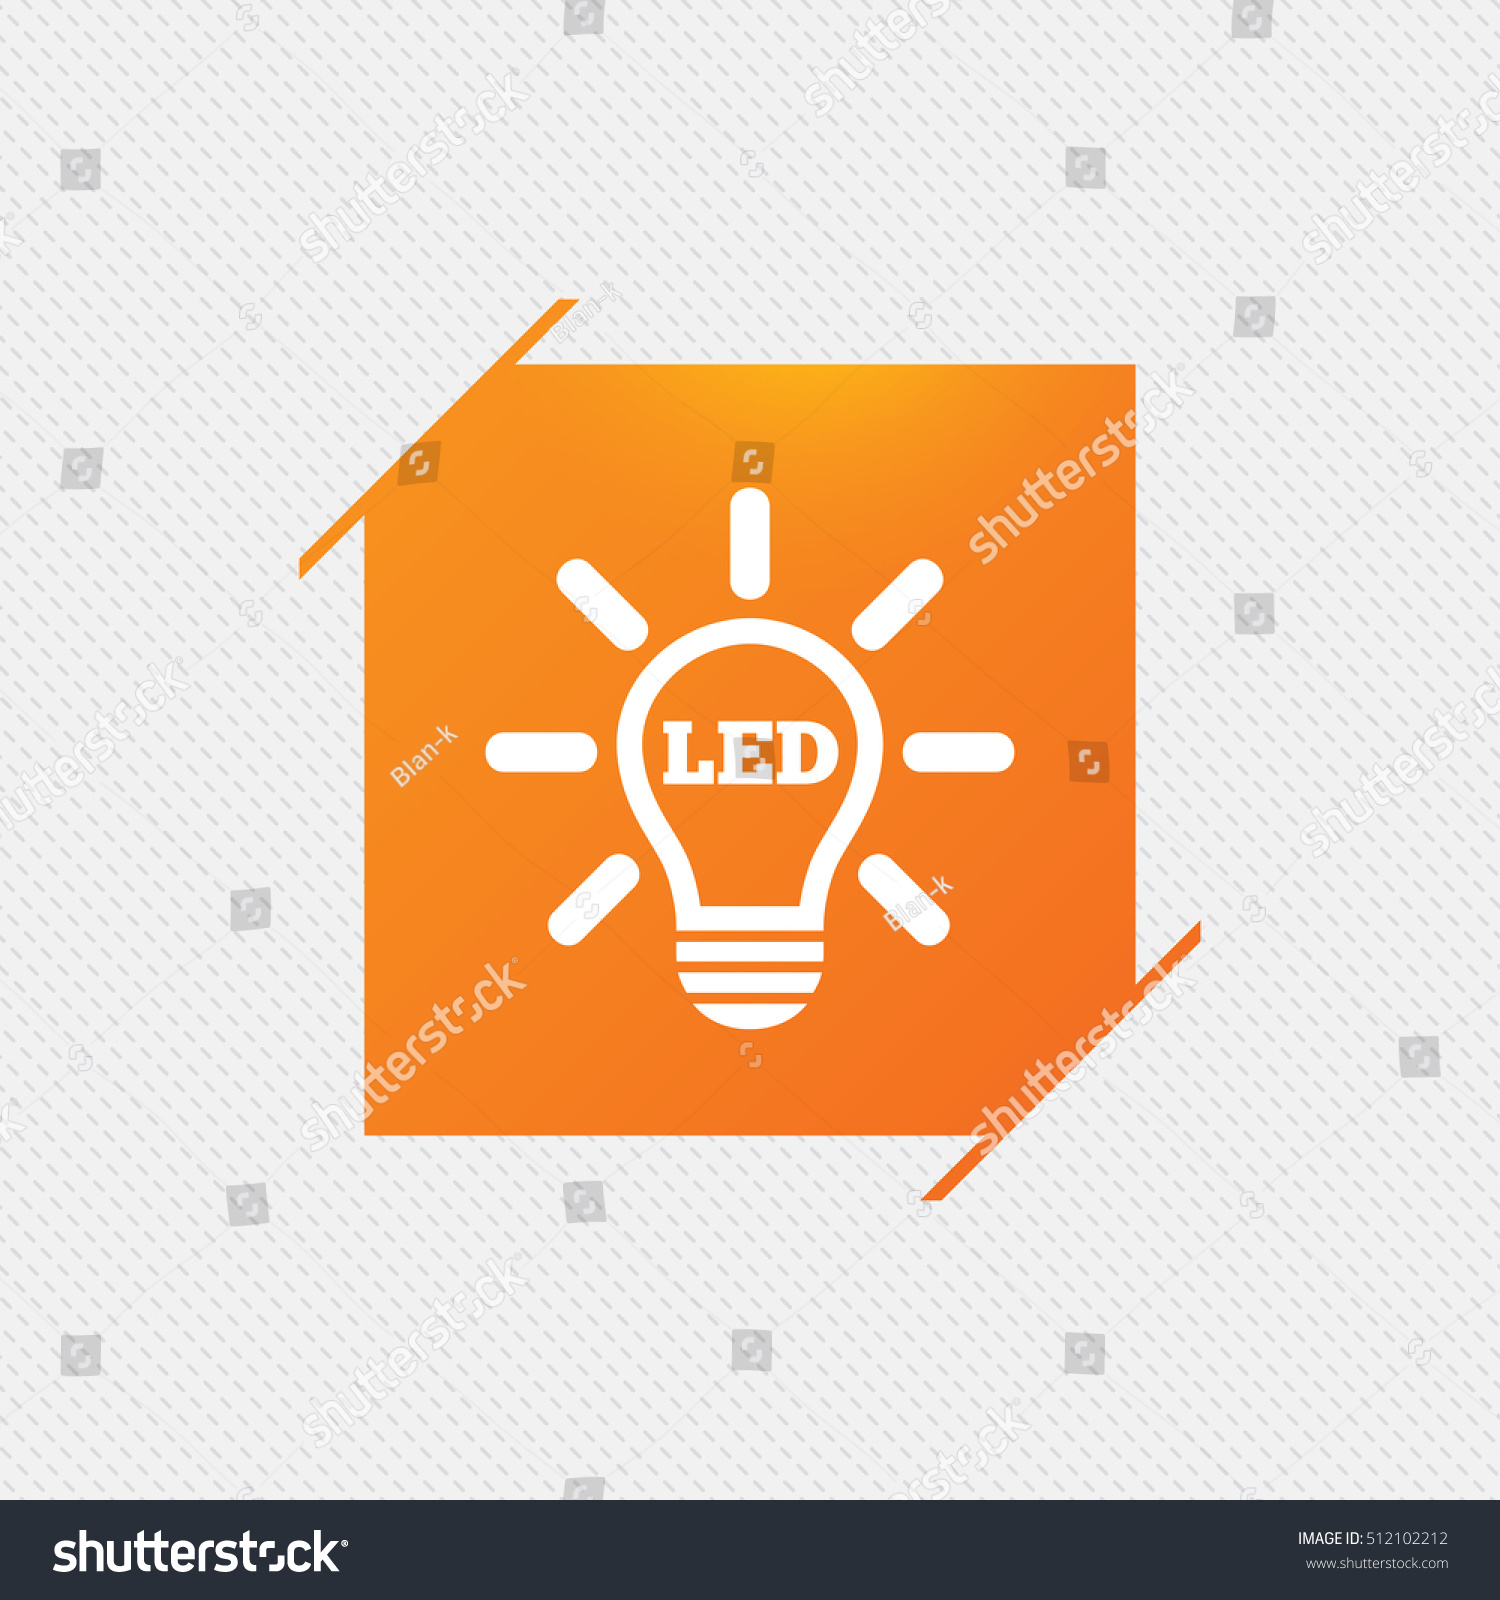 best led lights symbol images electrical circuit diagram